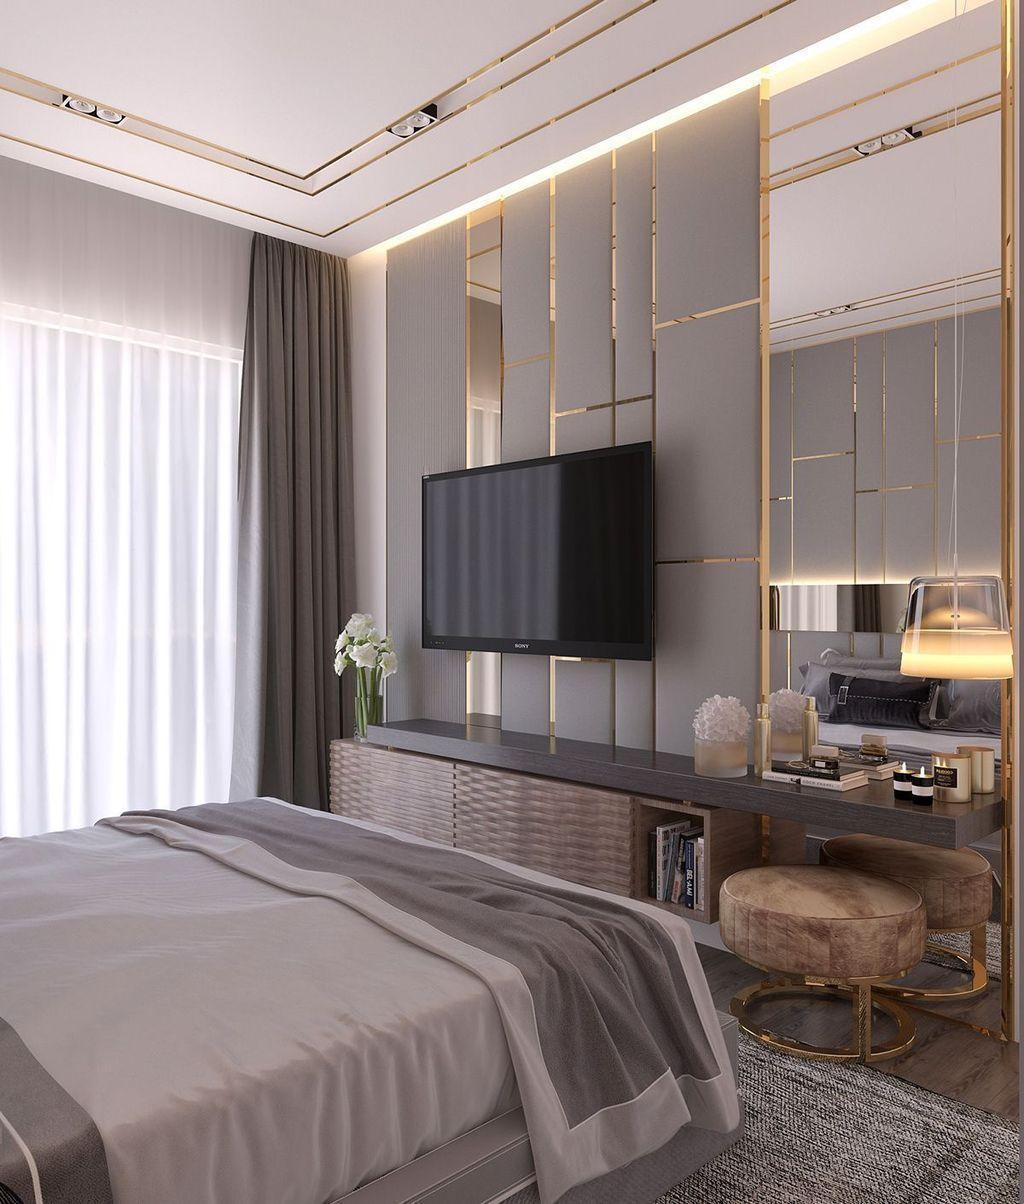 32 Nice Luxury Bedroom Design Ideas Looks Elegant in 2020 ...